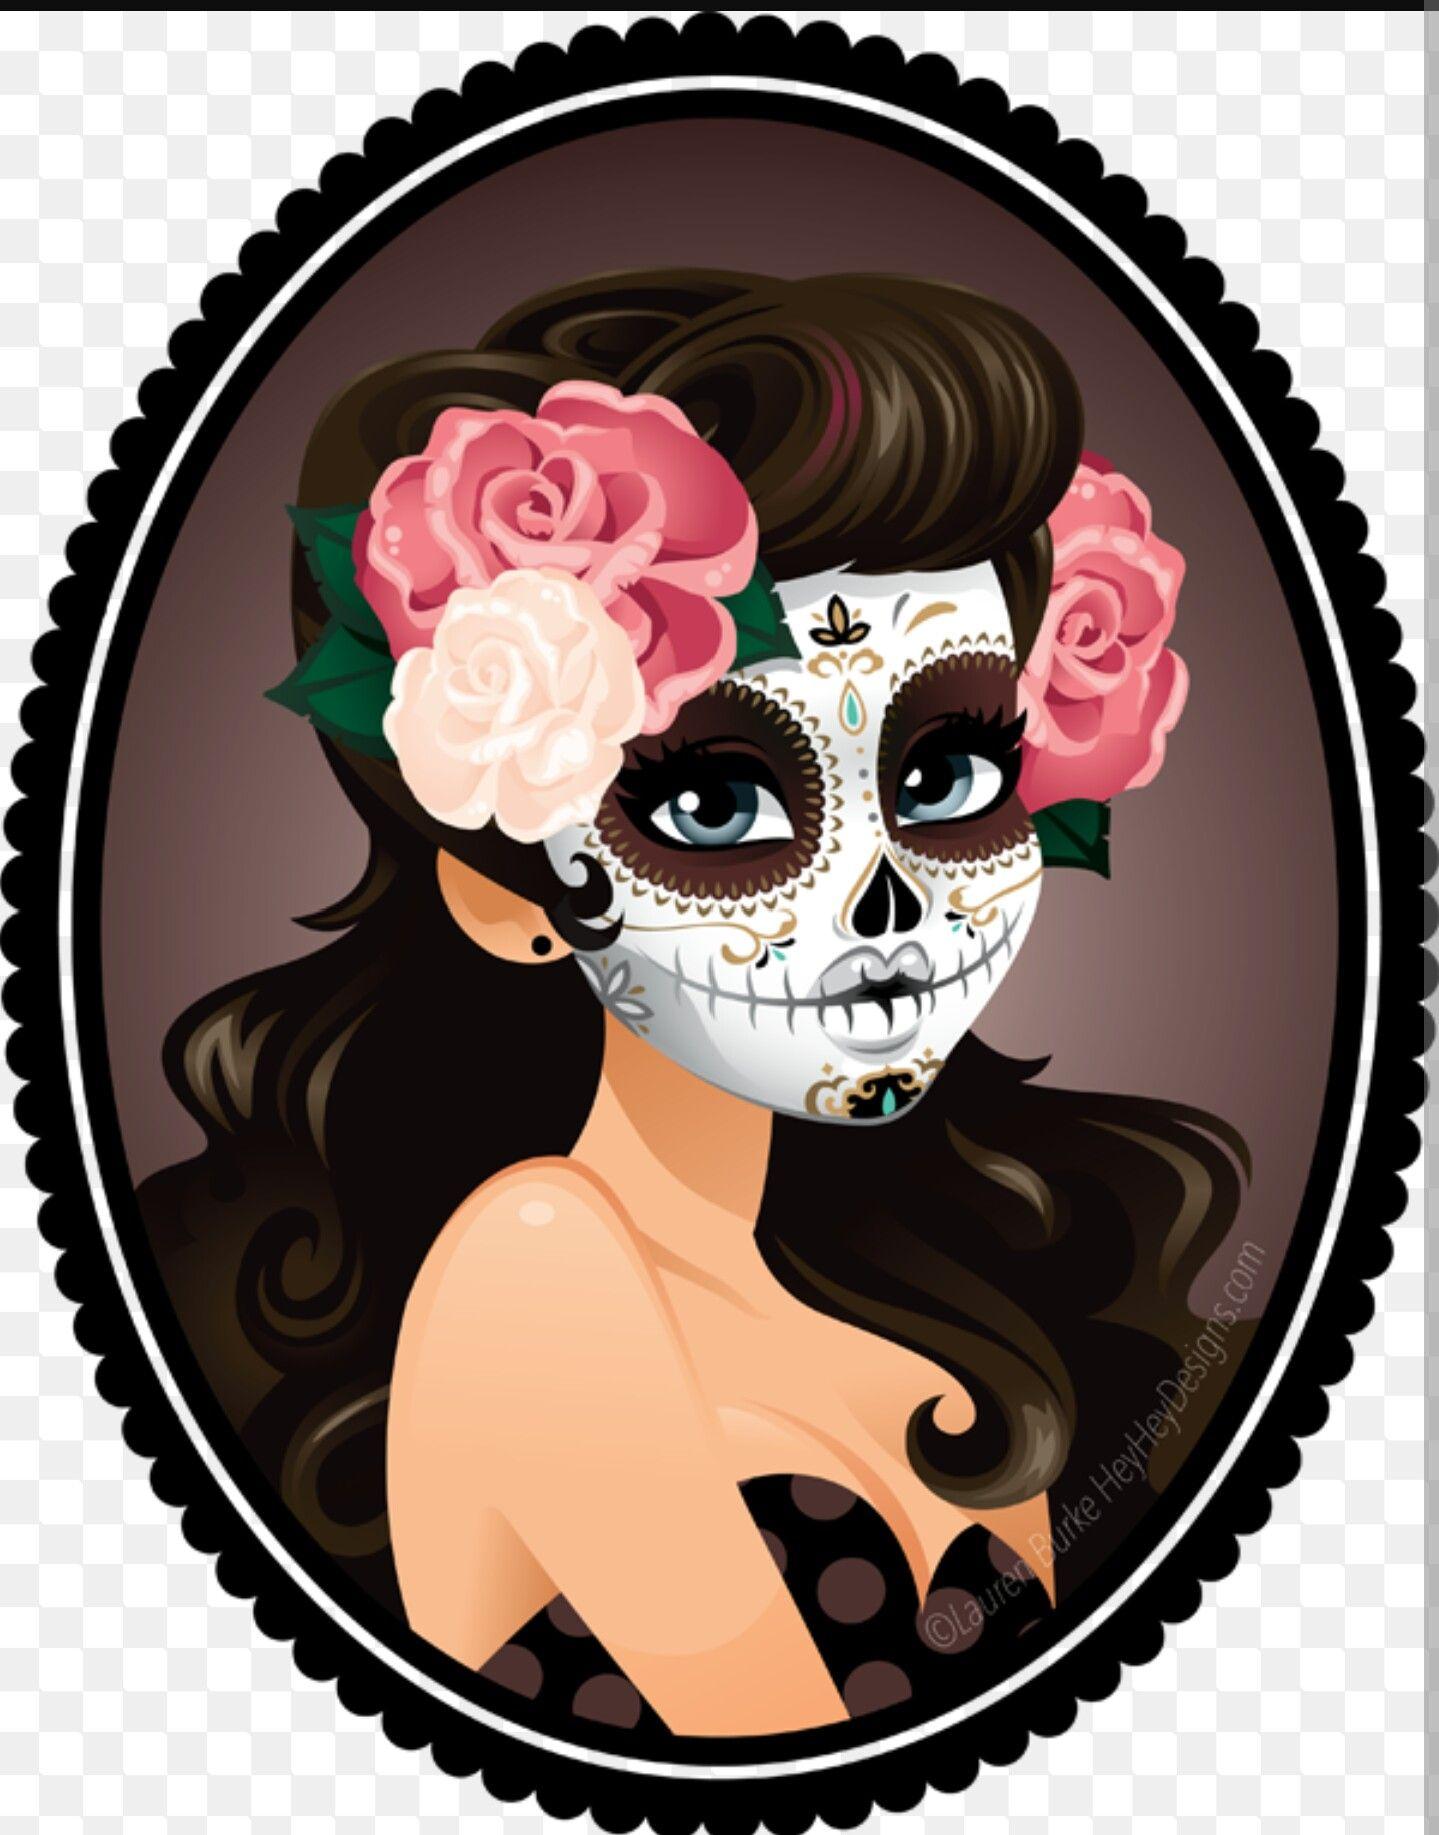 Dia de los muertos girly skull clipart svg royalty free Pin by Rhonda Farley-Hendrix on Sugar Skulls | Sugar skull girl, Day ... svg royalty free